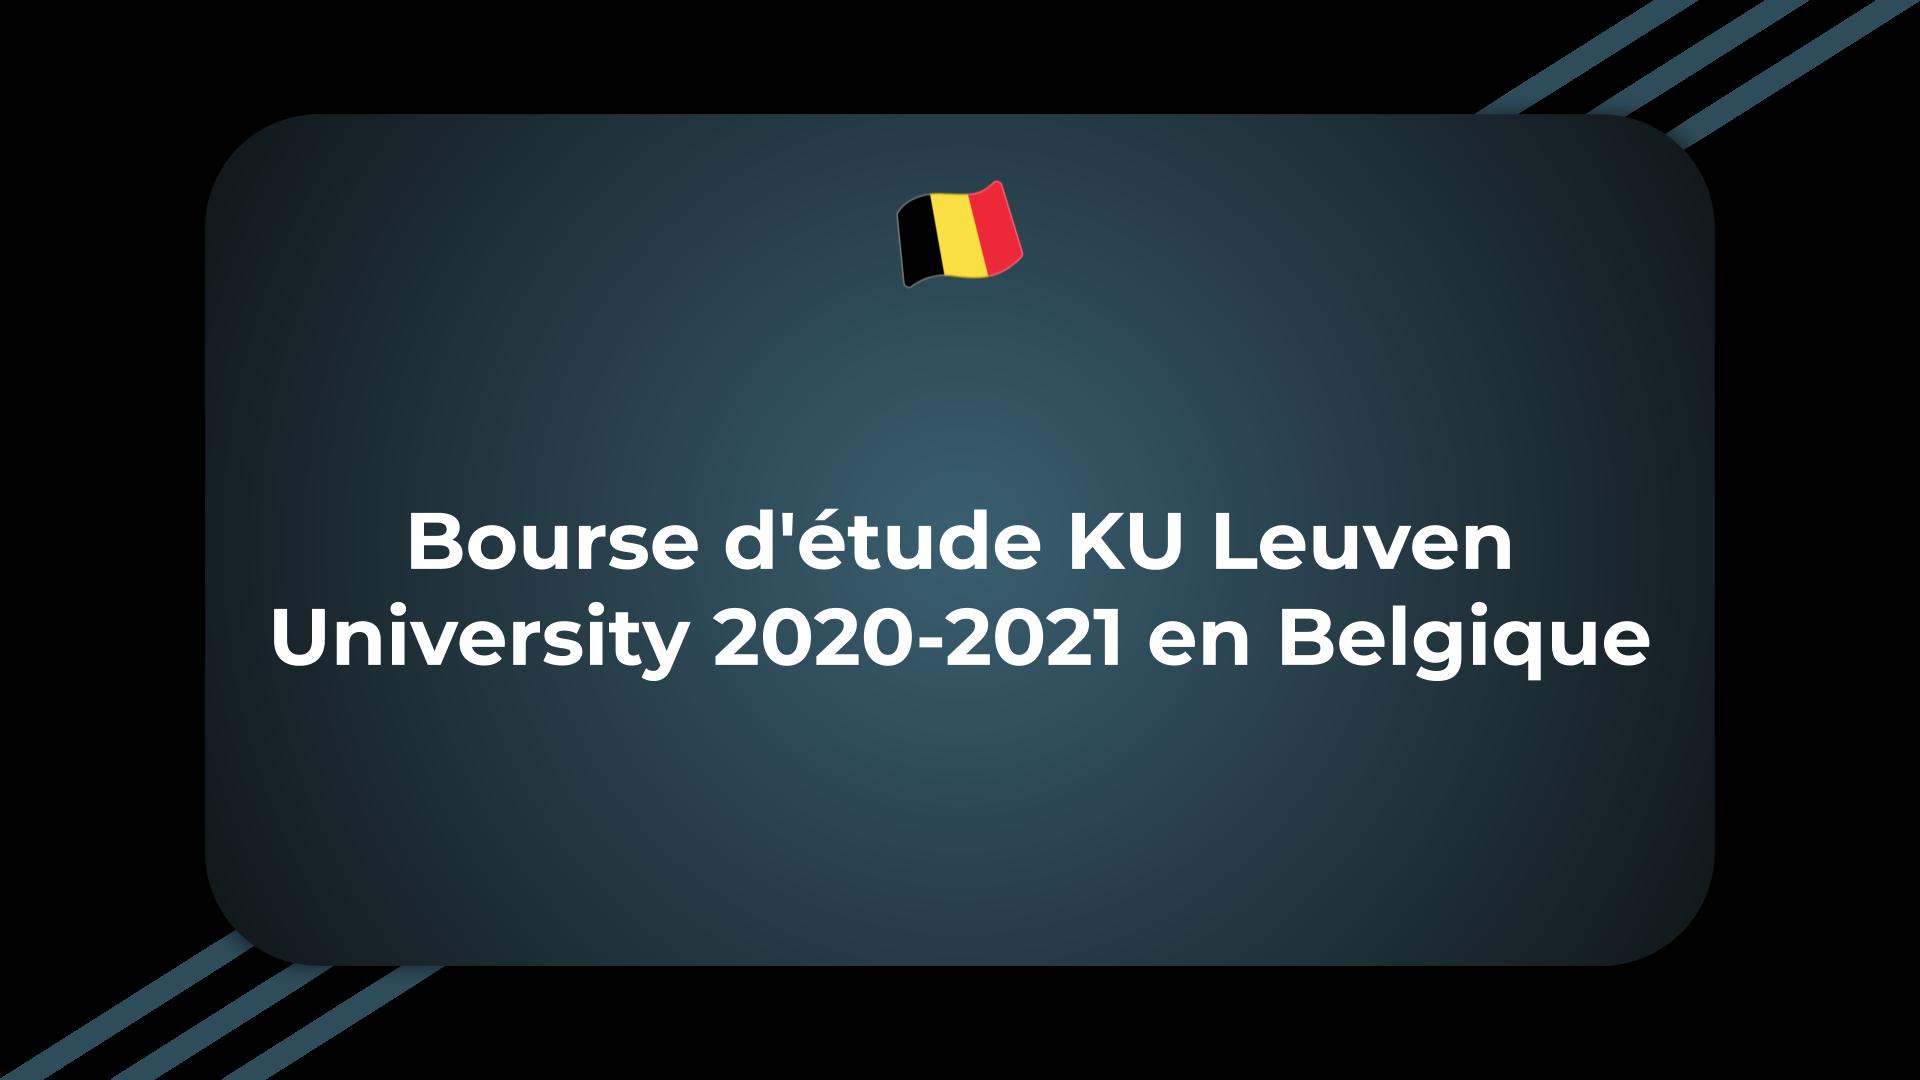 Bourse d'étude KU Leuven University